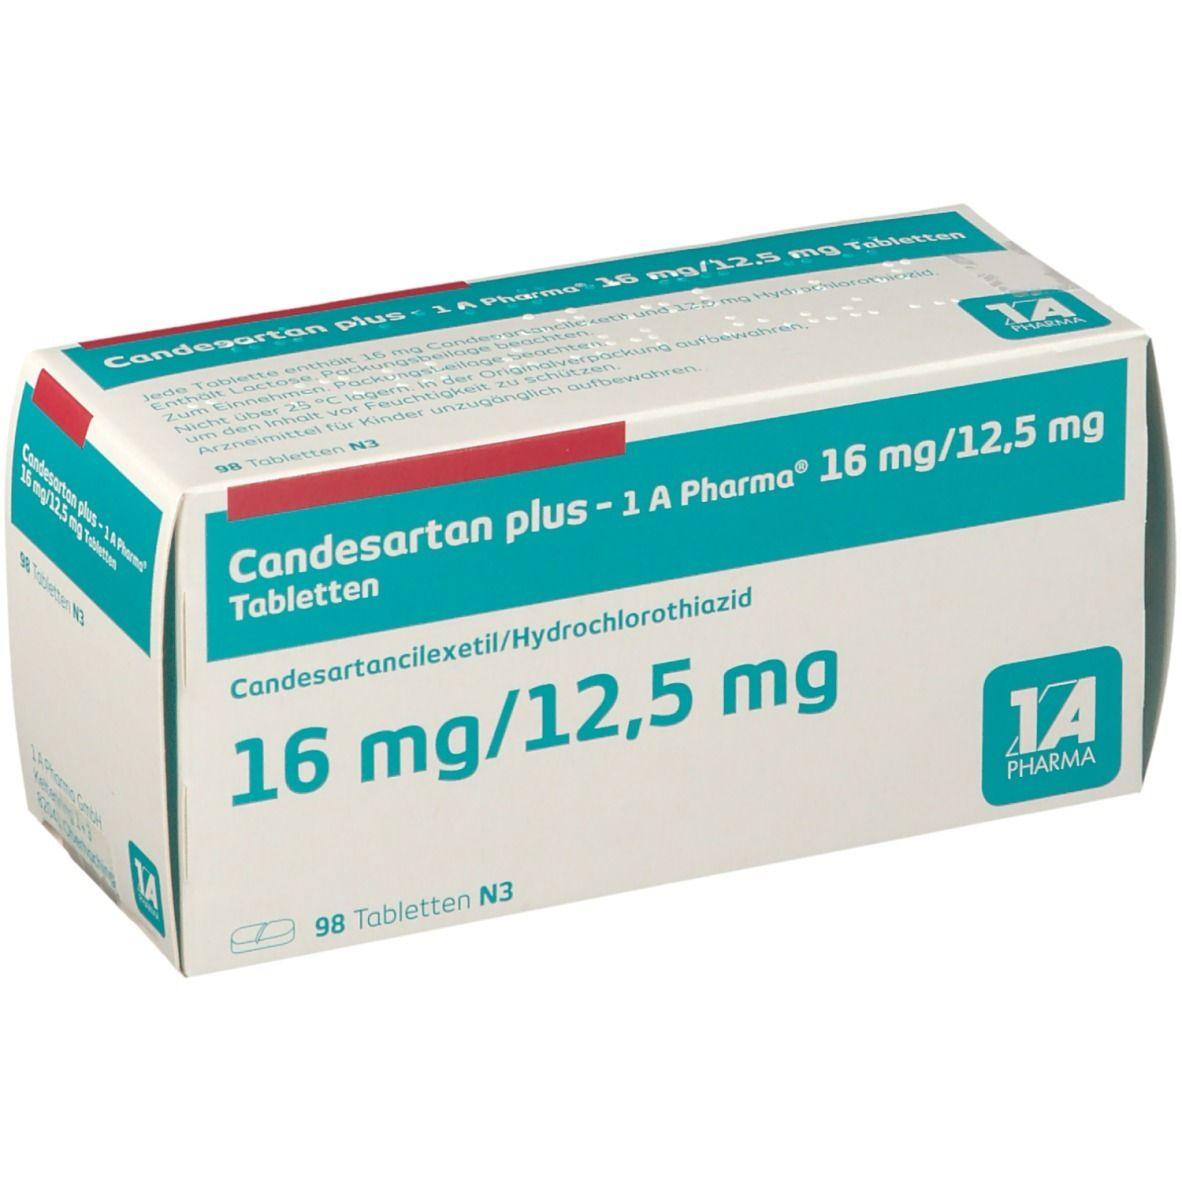 CANDESARTAN plus 1A Pharma 16 mg/125 mg Tabletten 98 St ...